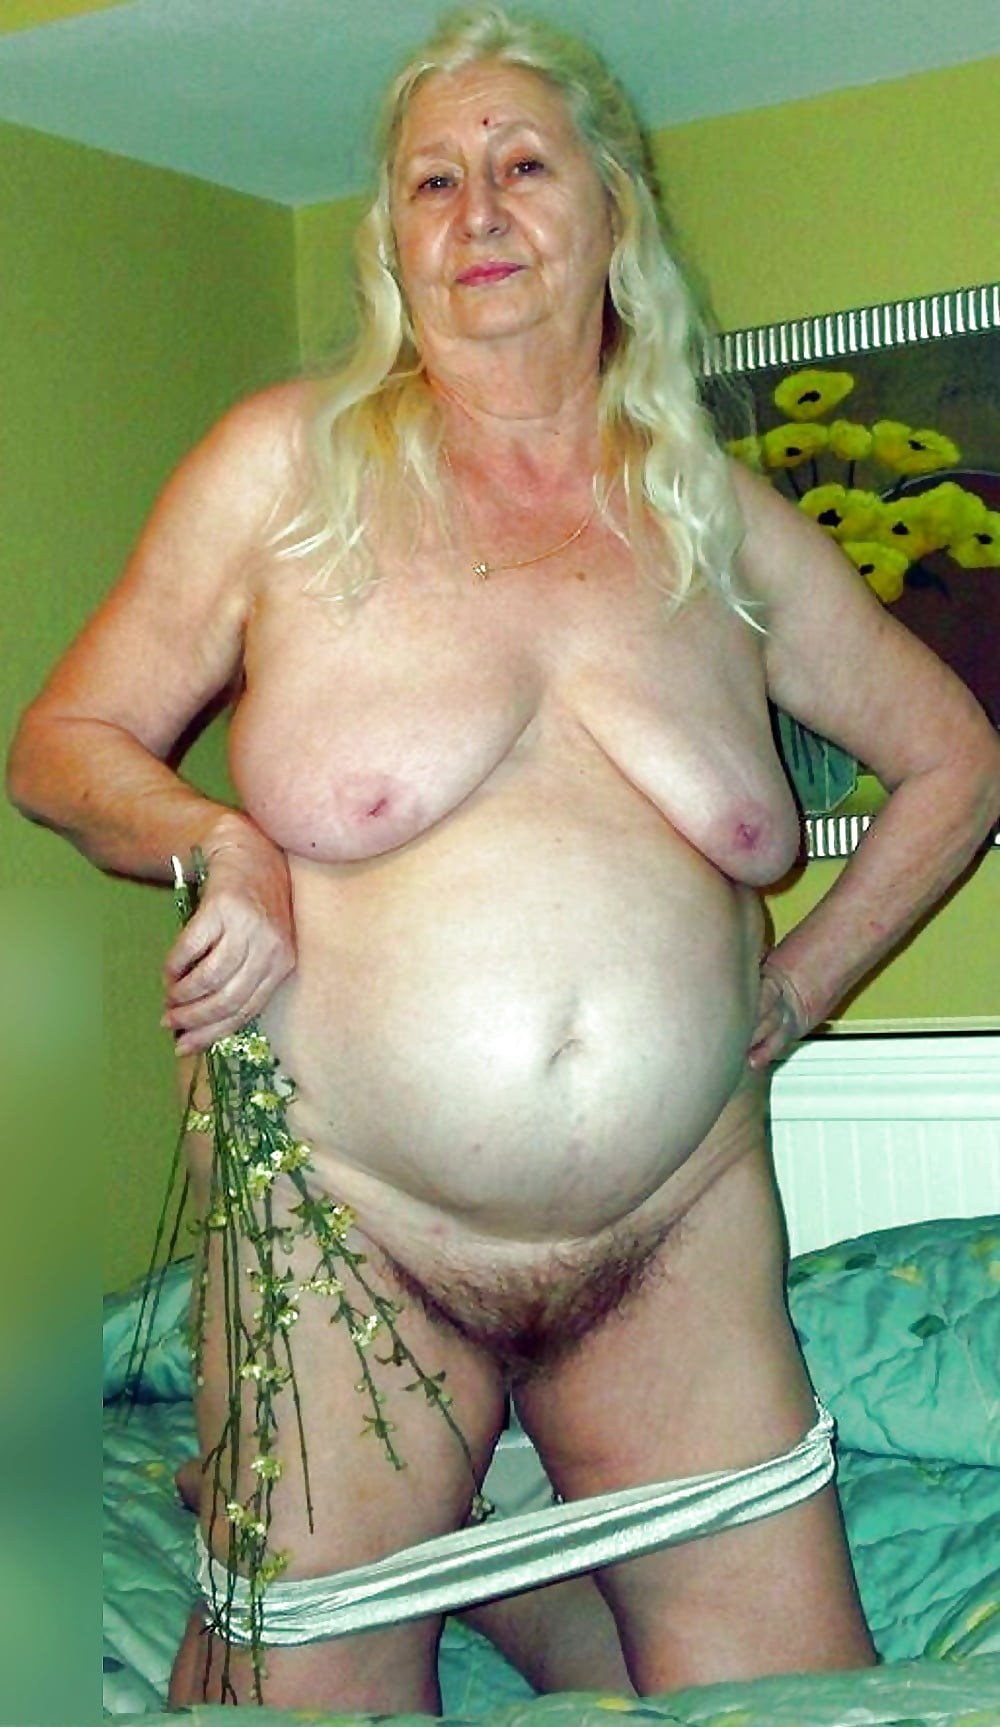 Porno granny sex pictures hairy saggy sex maroc avatar